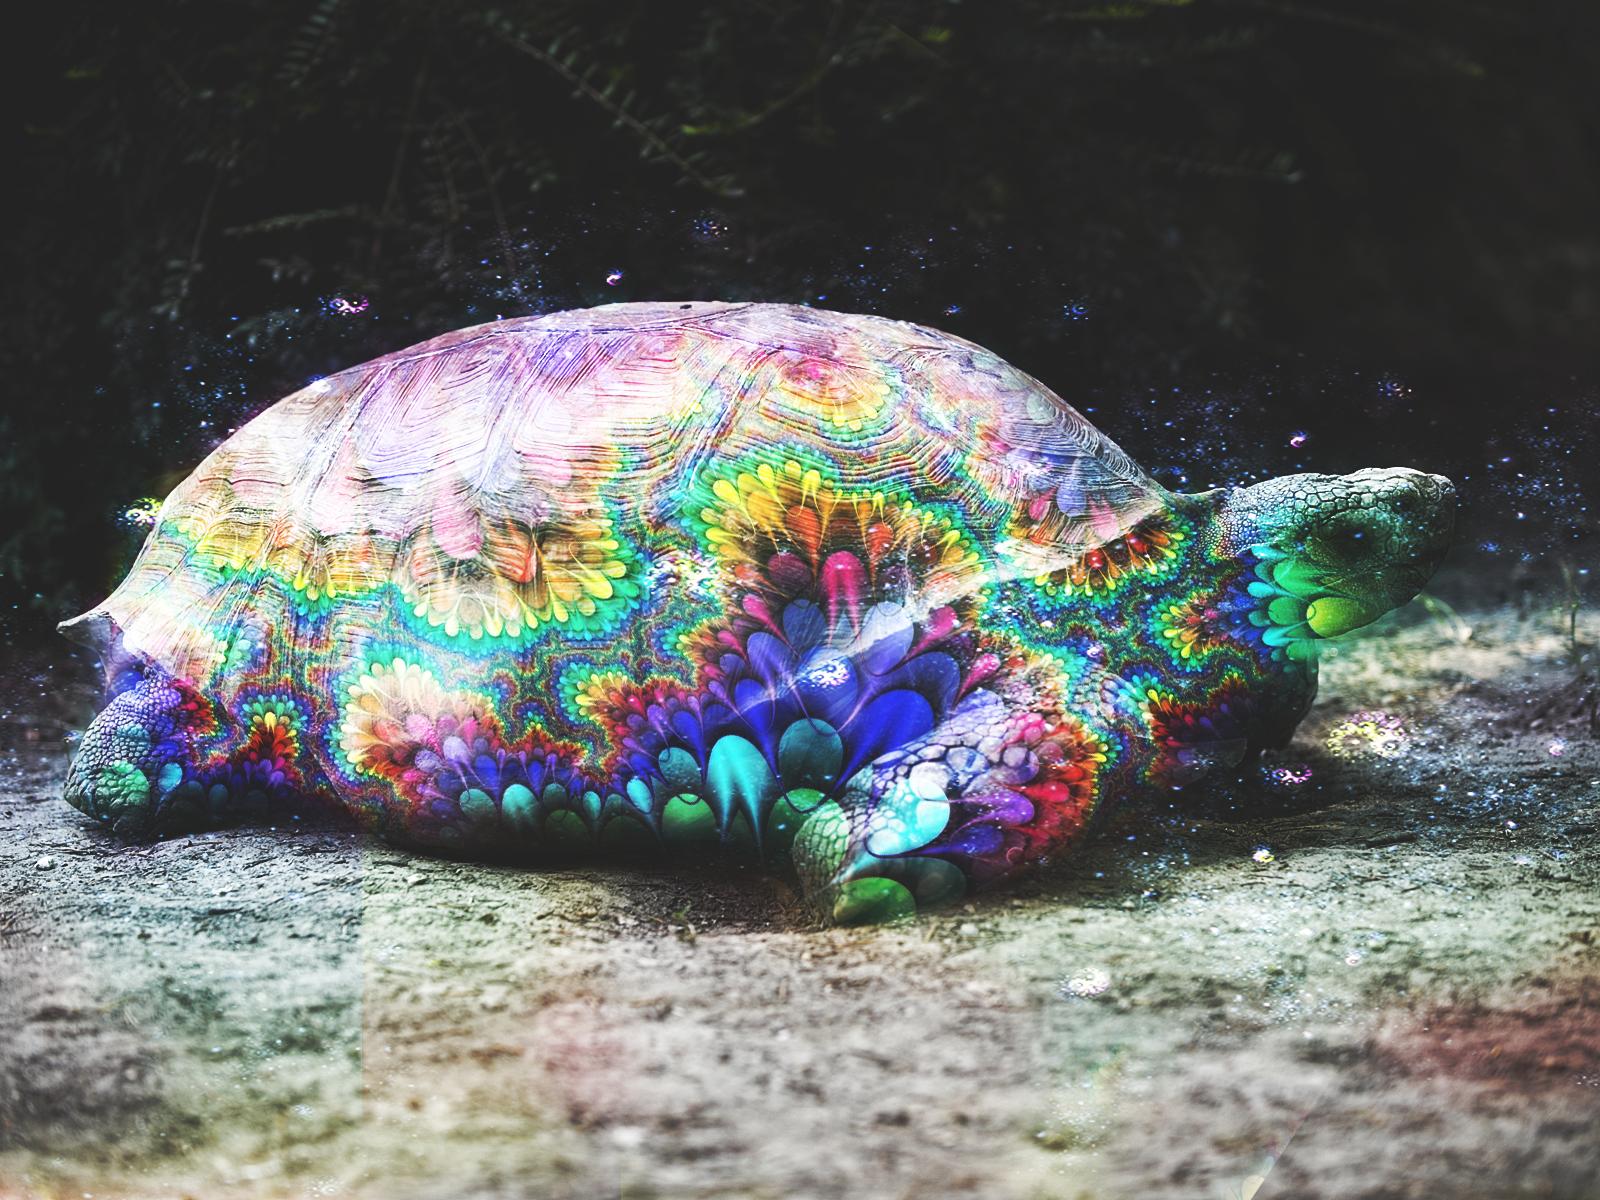 Trippy Turtle by Empyree on DeviantArt